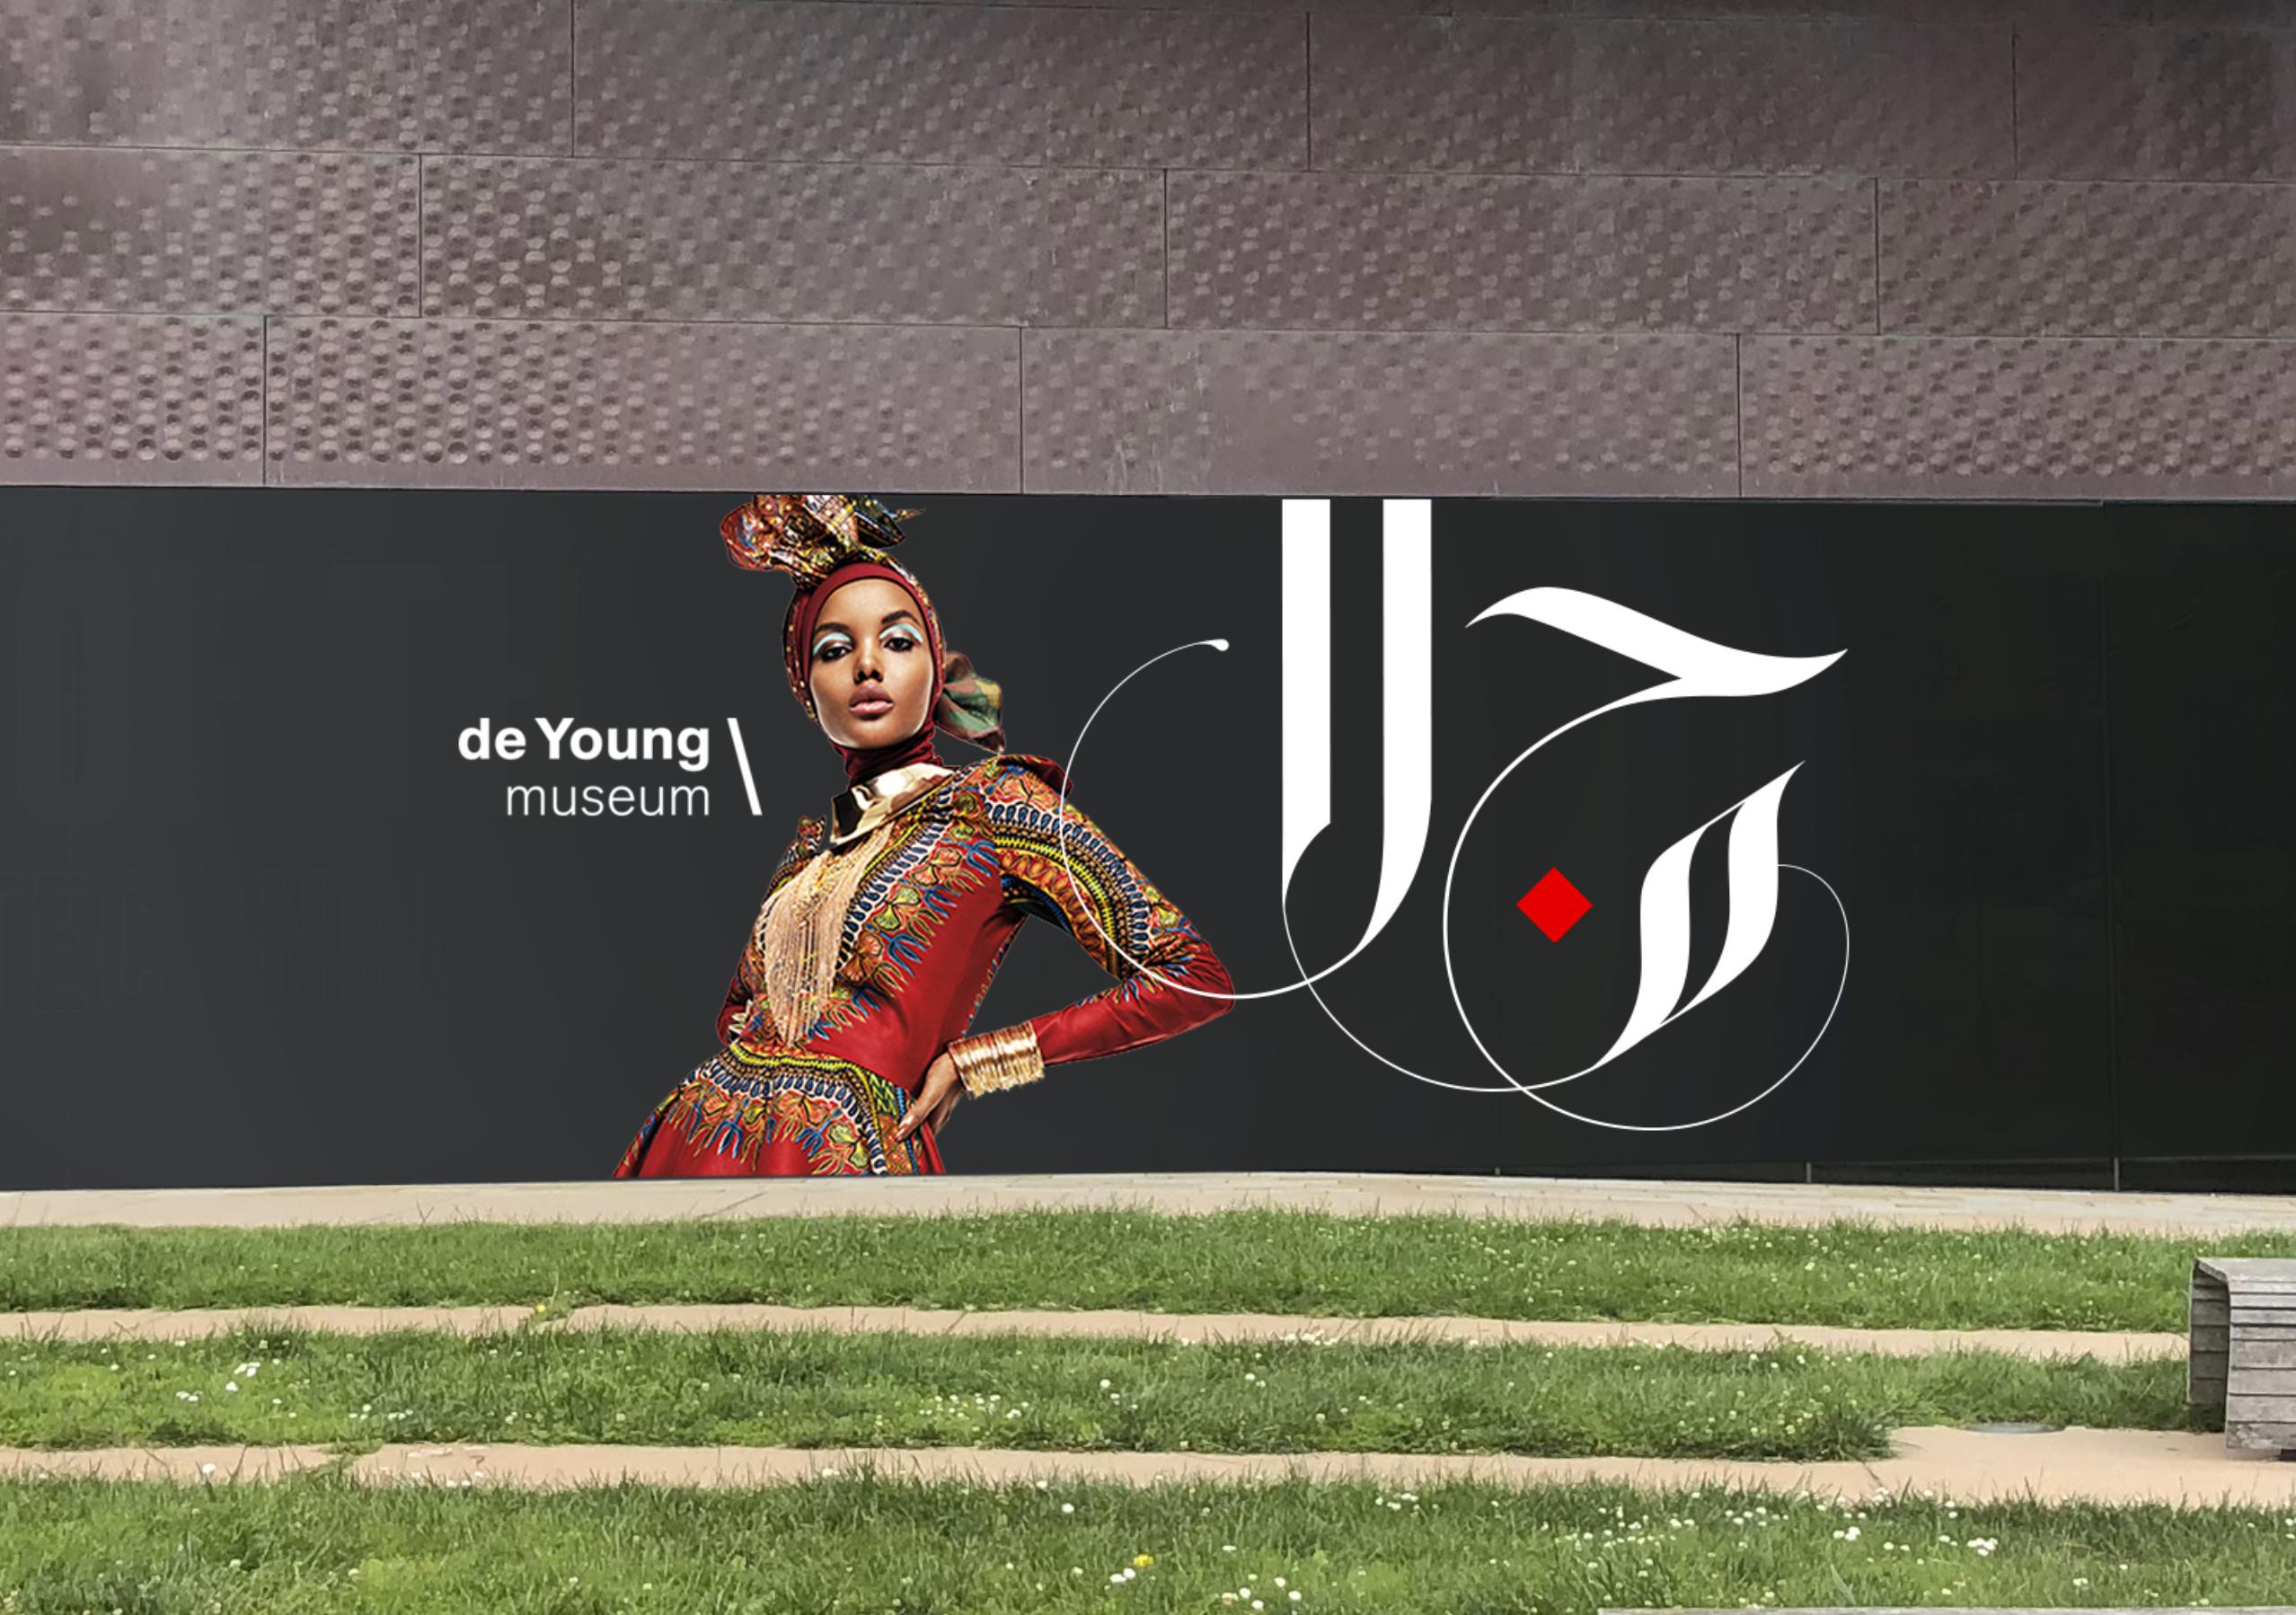 Calligraphy + de Young + Halima Aden